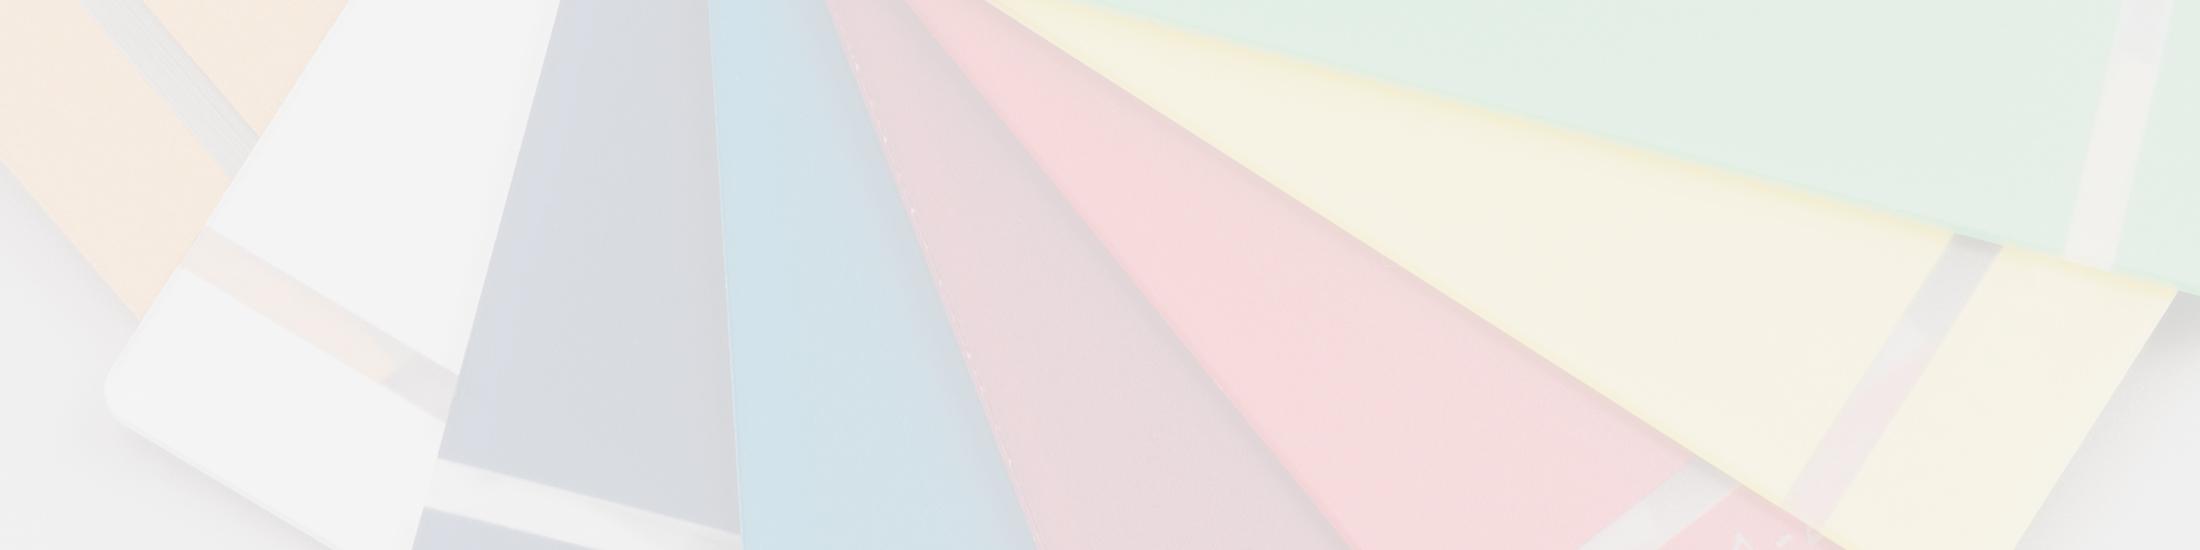 acrylic sheet TroLase Reverse